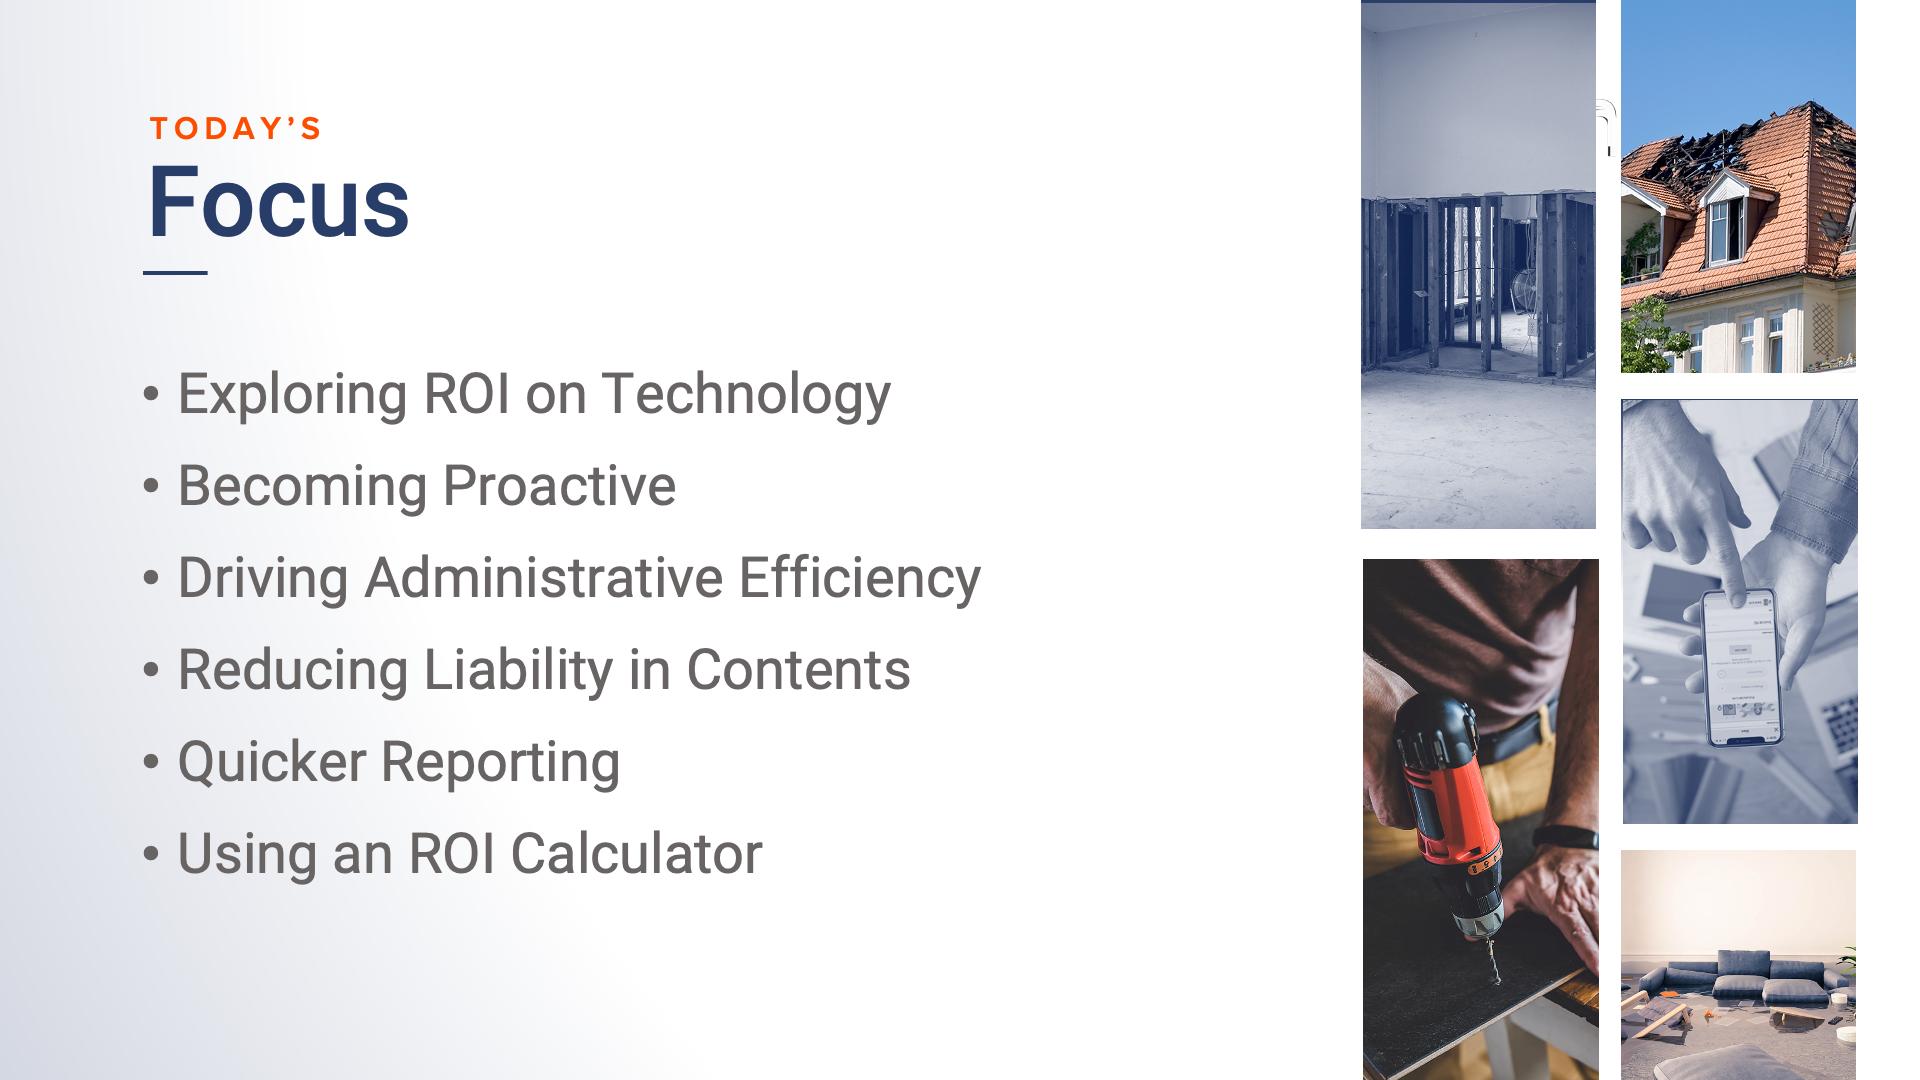 1b-Sm-Intro-Exploring-ROI-on-Technology-3-Tools-Workshop